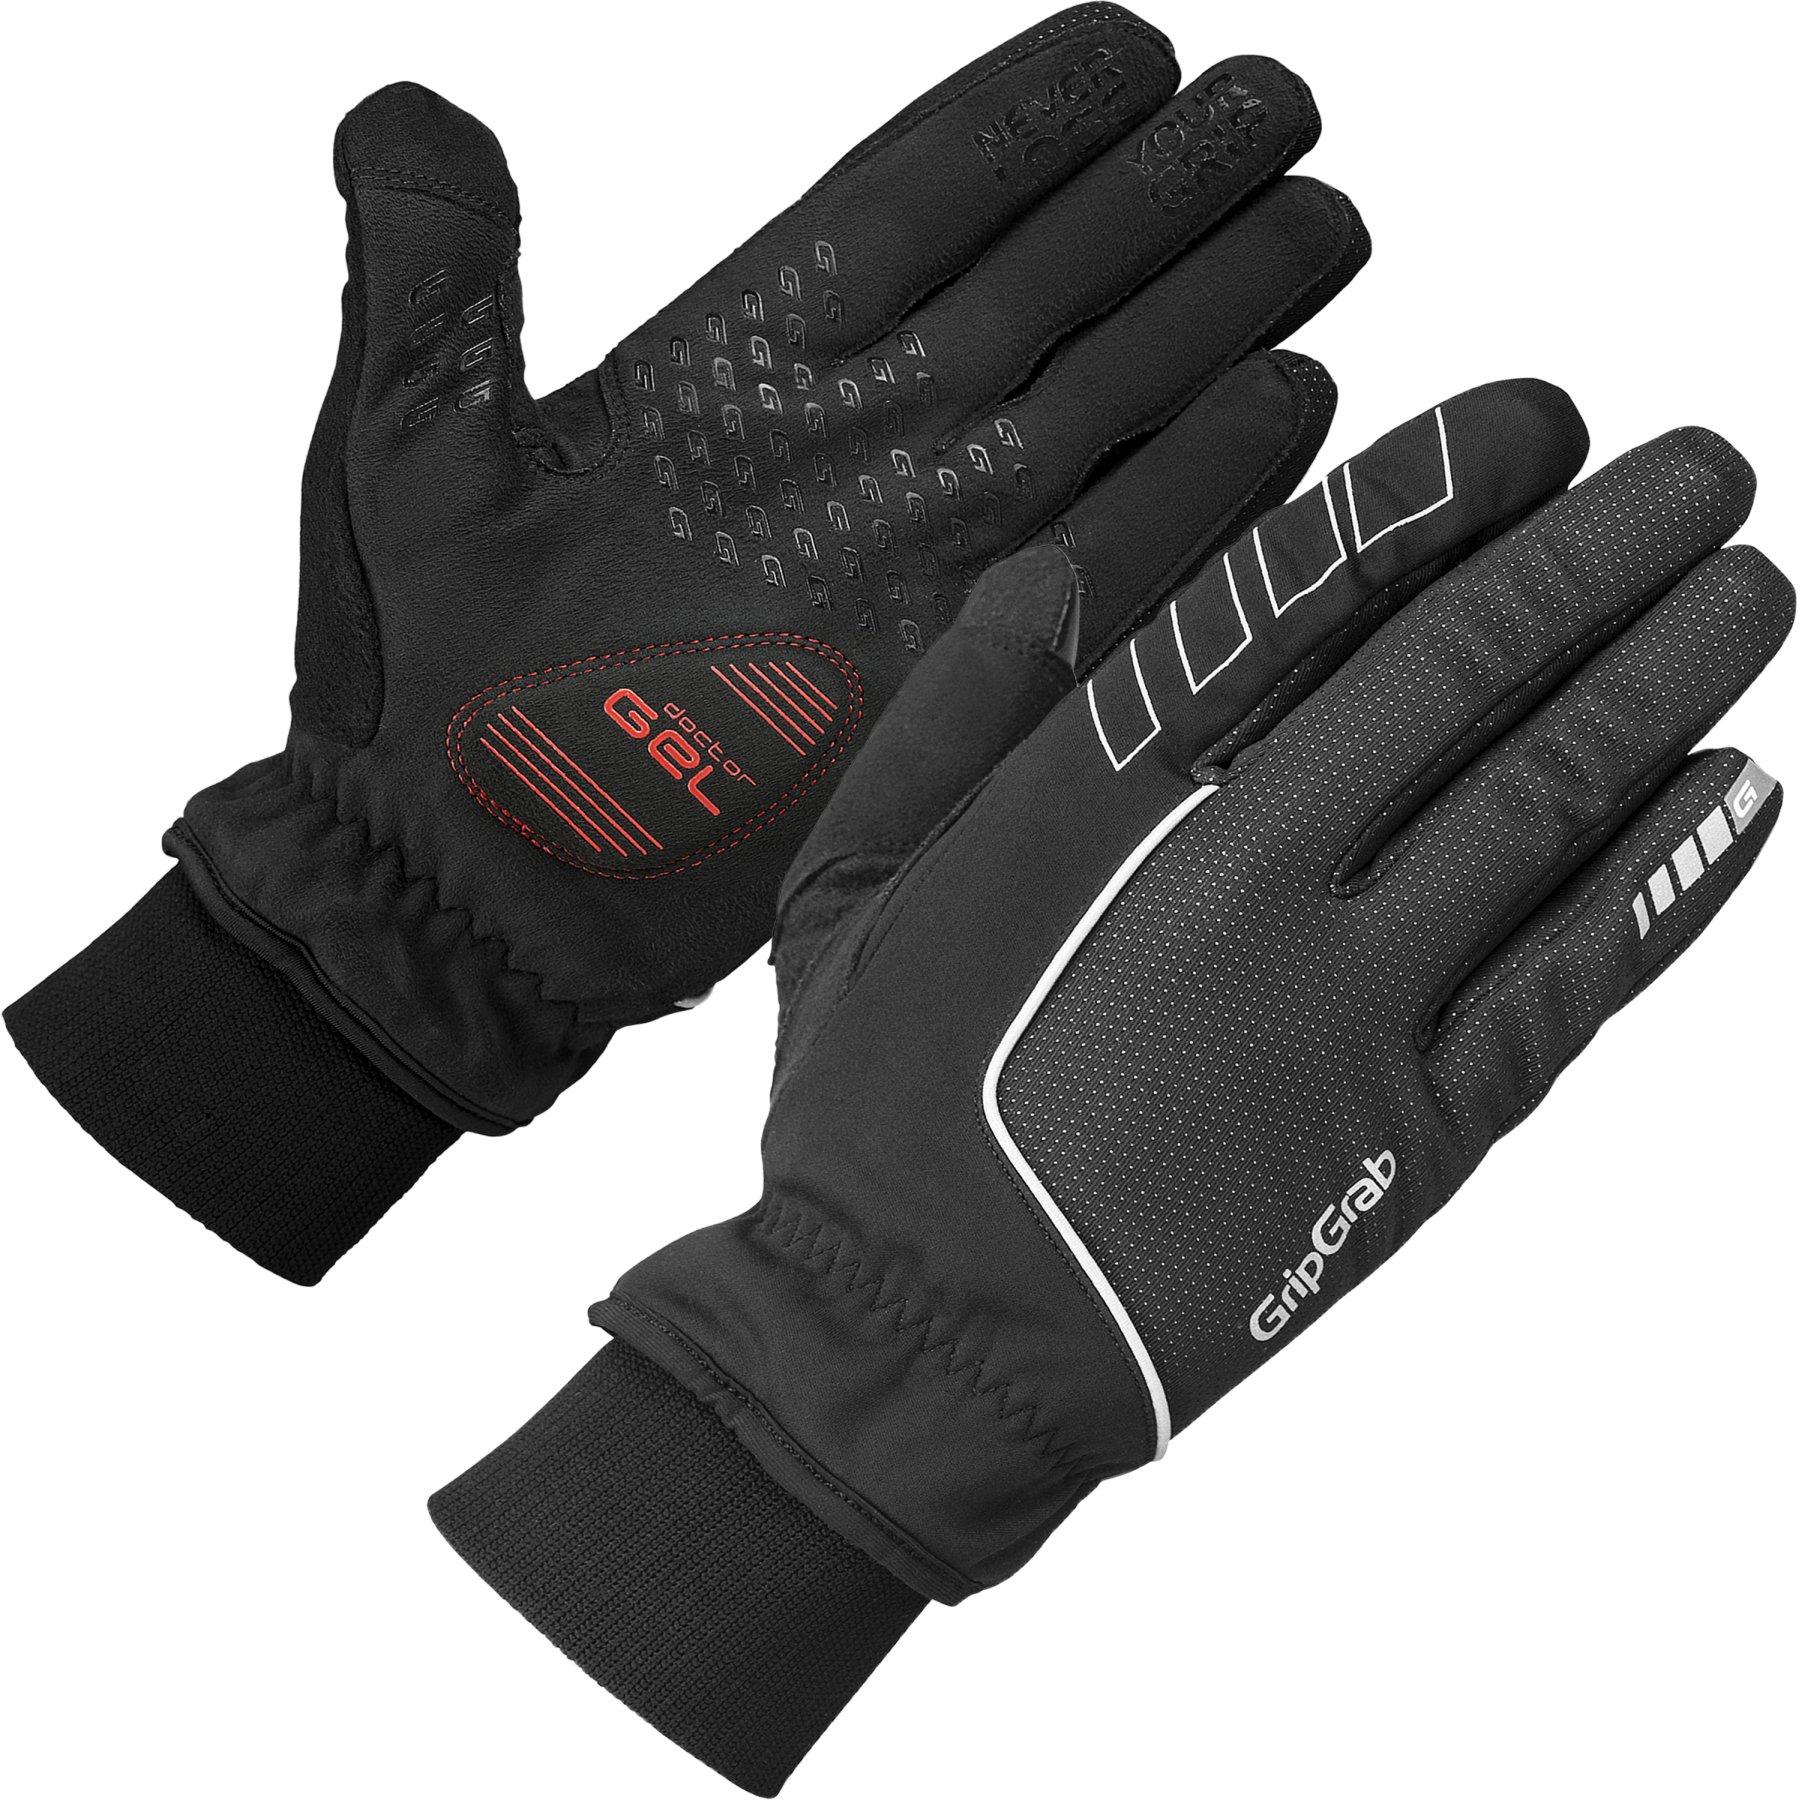 GripGrab Windster Windproof Winter Glove - Black